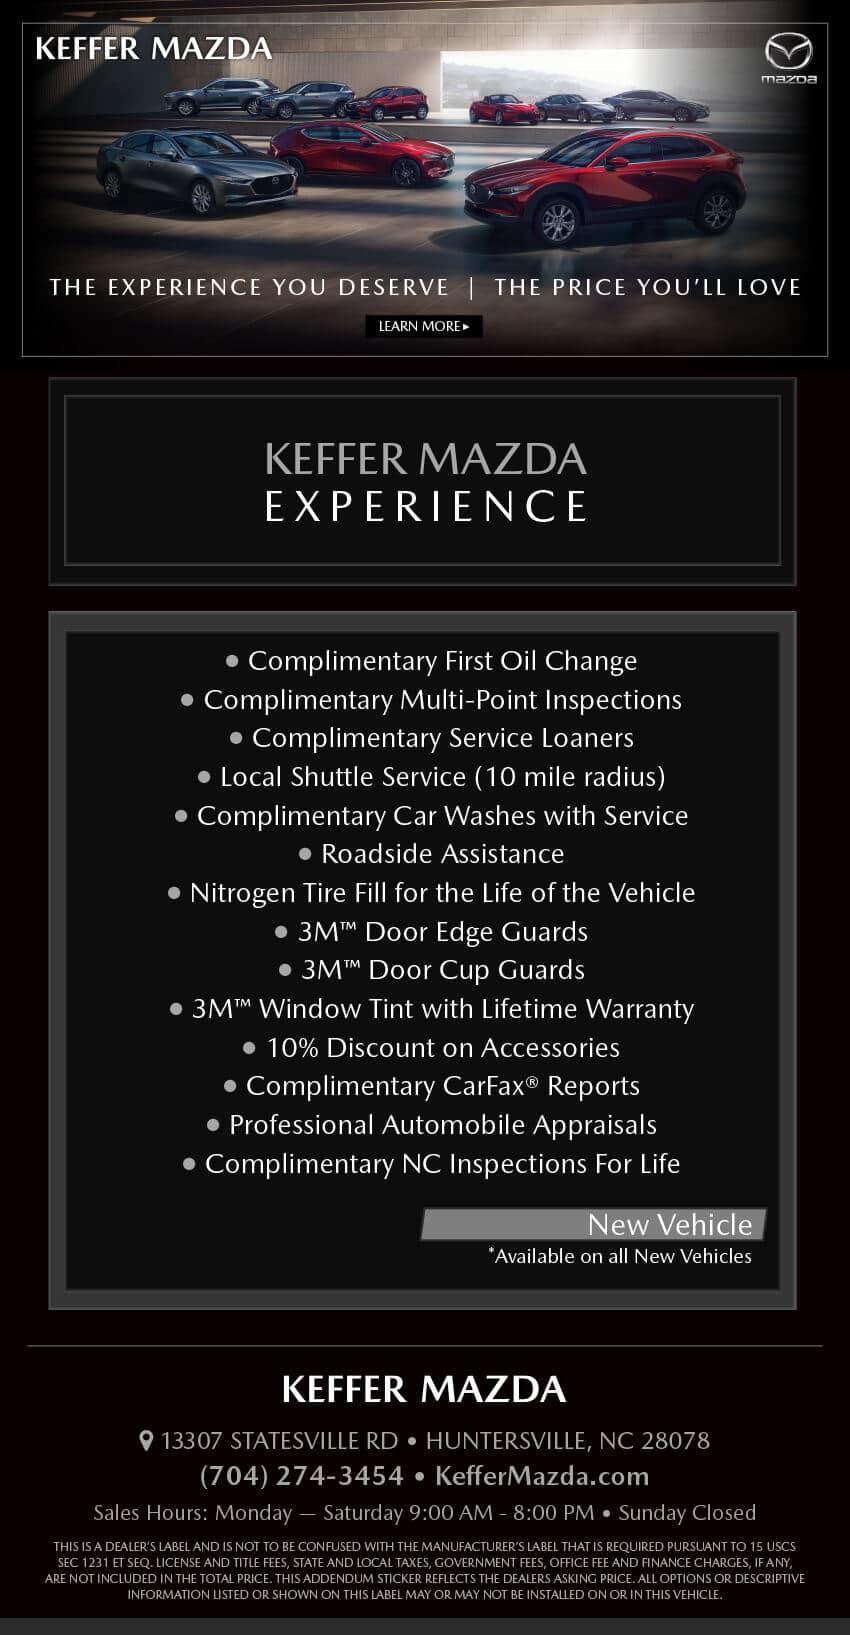 2021.02.24_Keffer-Mazda-Experience-New-Vehicle-Landing-PG_S50925ll